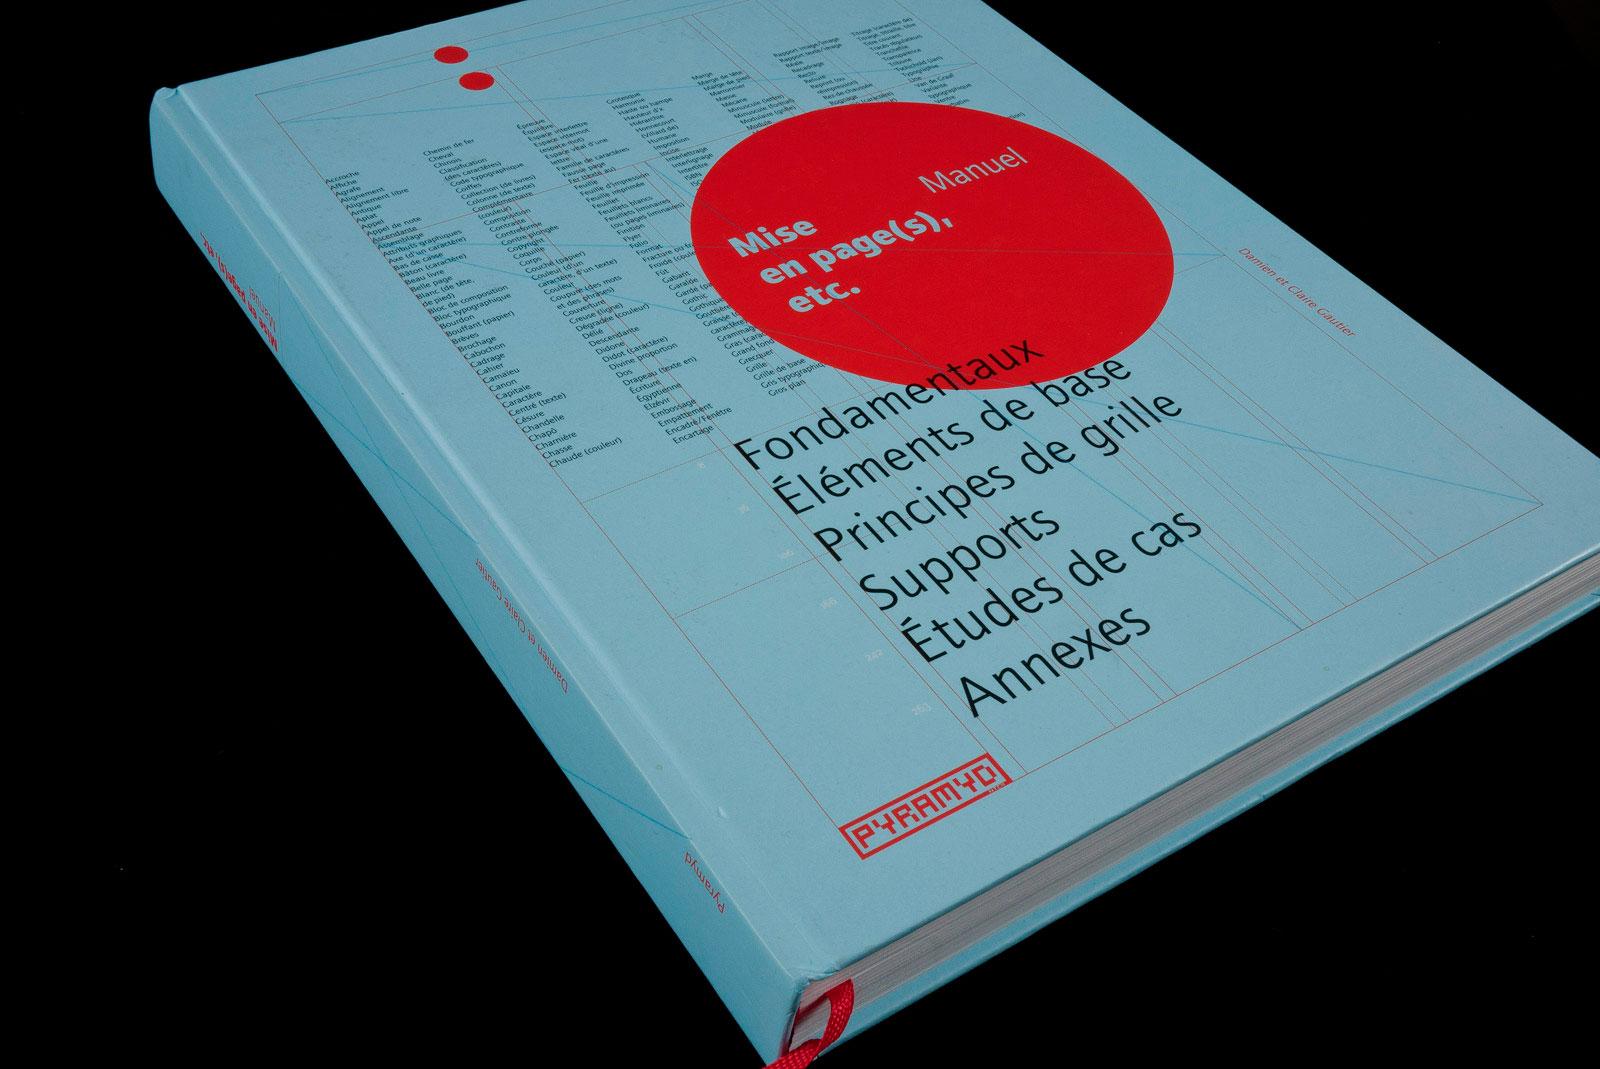 Mise-en-pages-etc-Damien-Gautier-bibliotheque-index-grafik